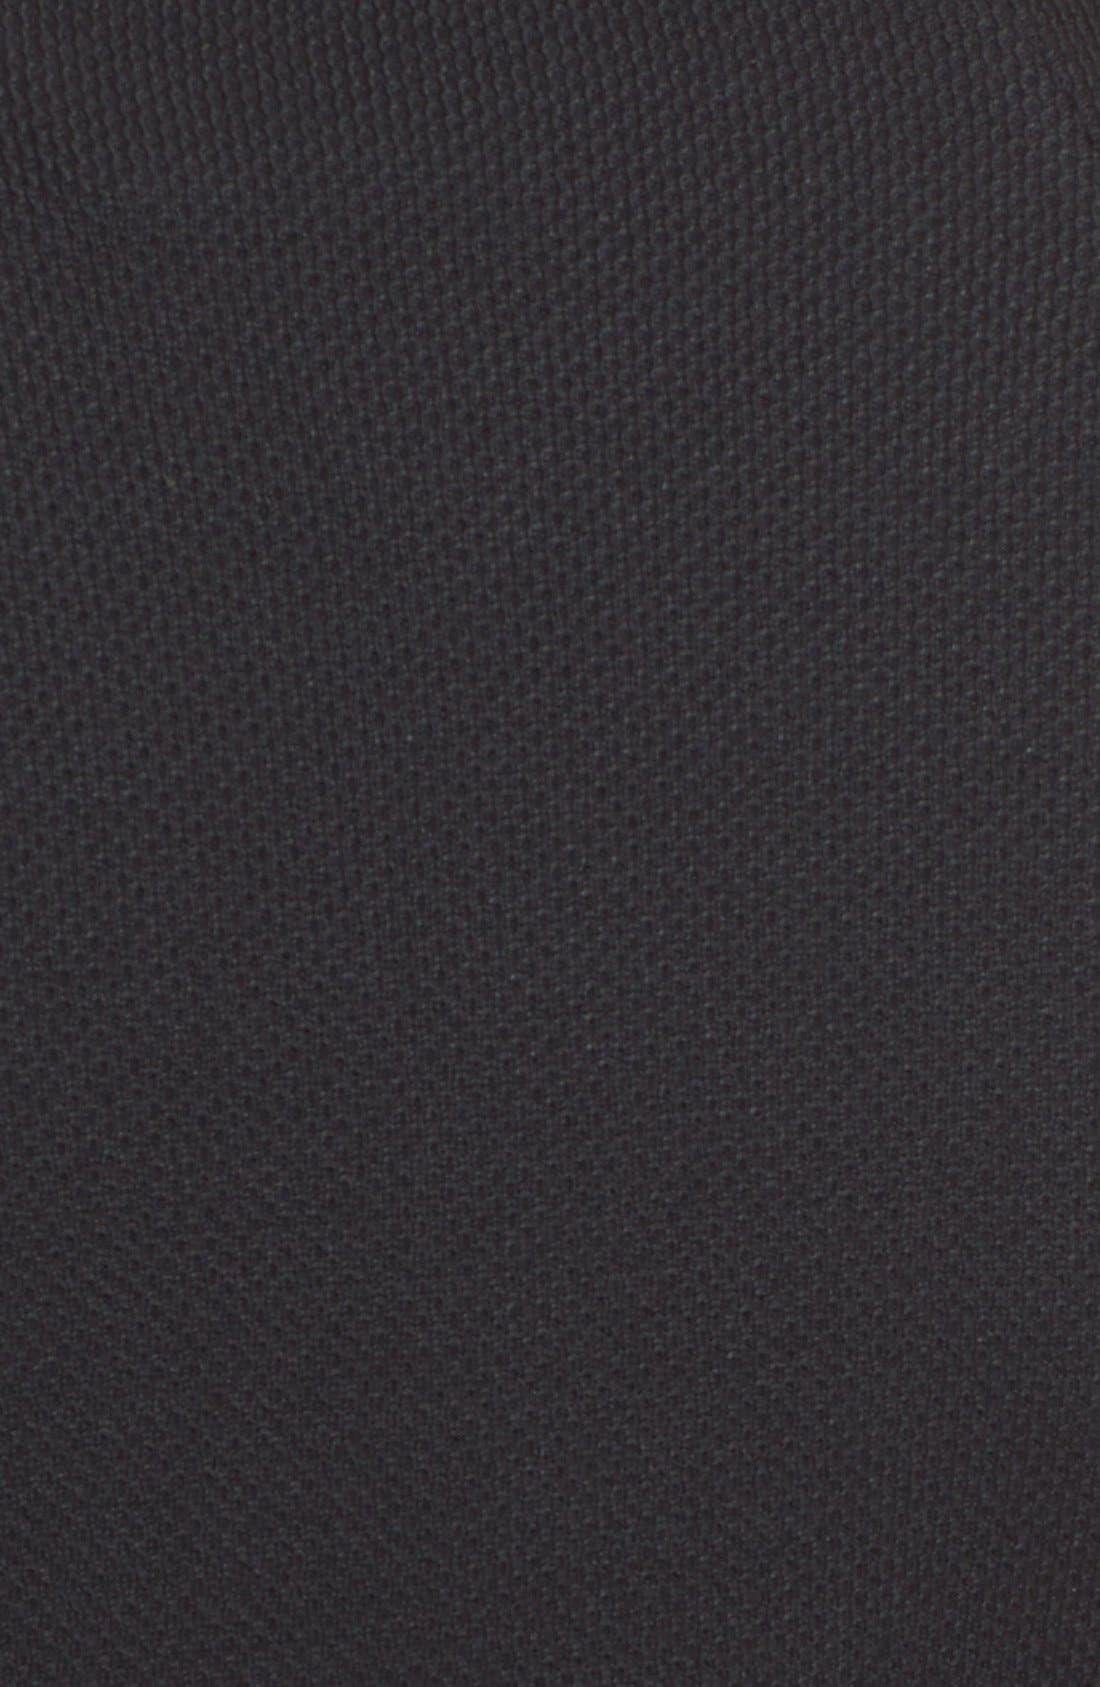 Milano Piqué Knit Jacket,                             Alternate thumbnail 3, color,                             CAVIAR